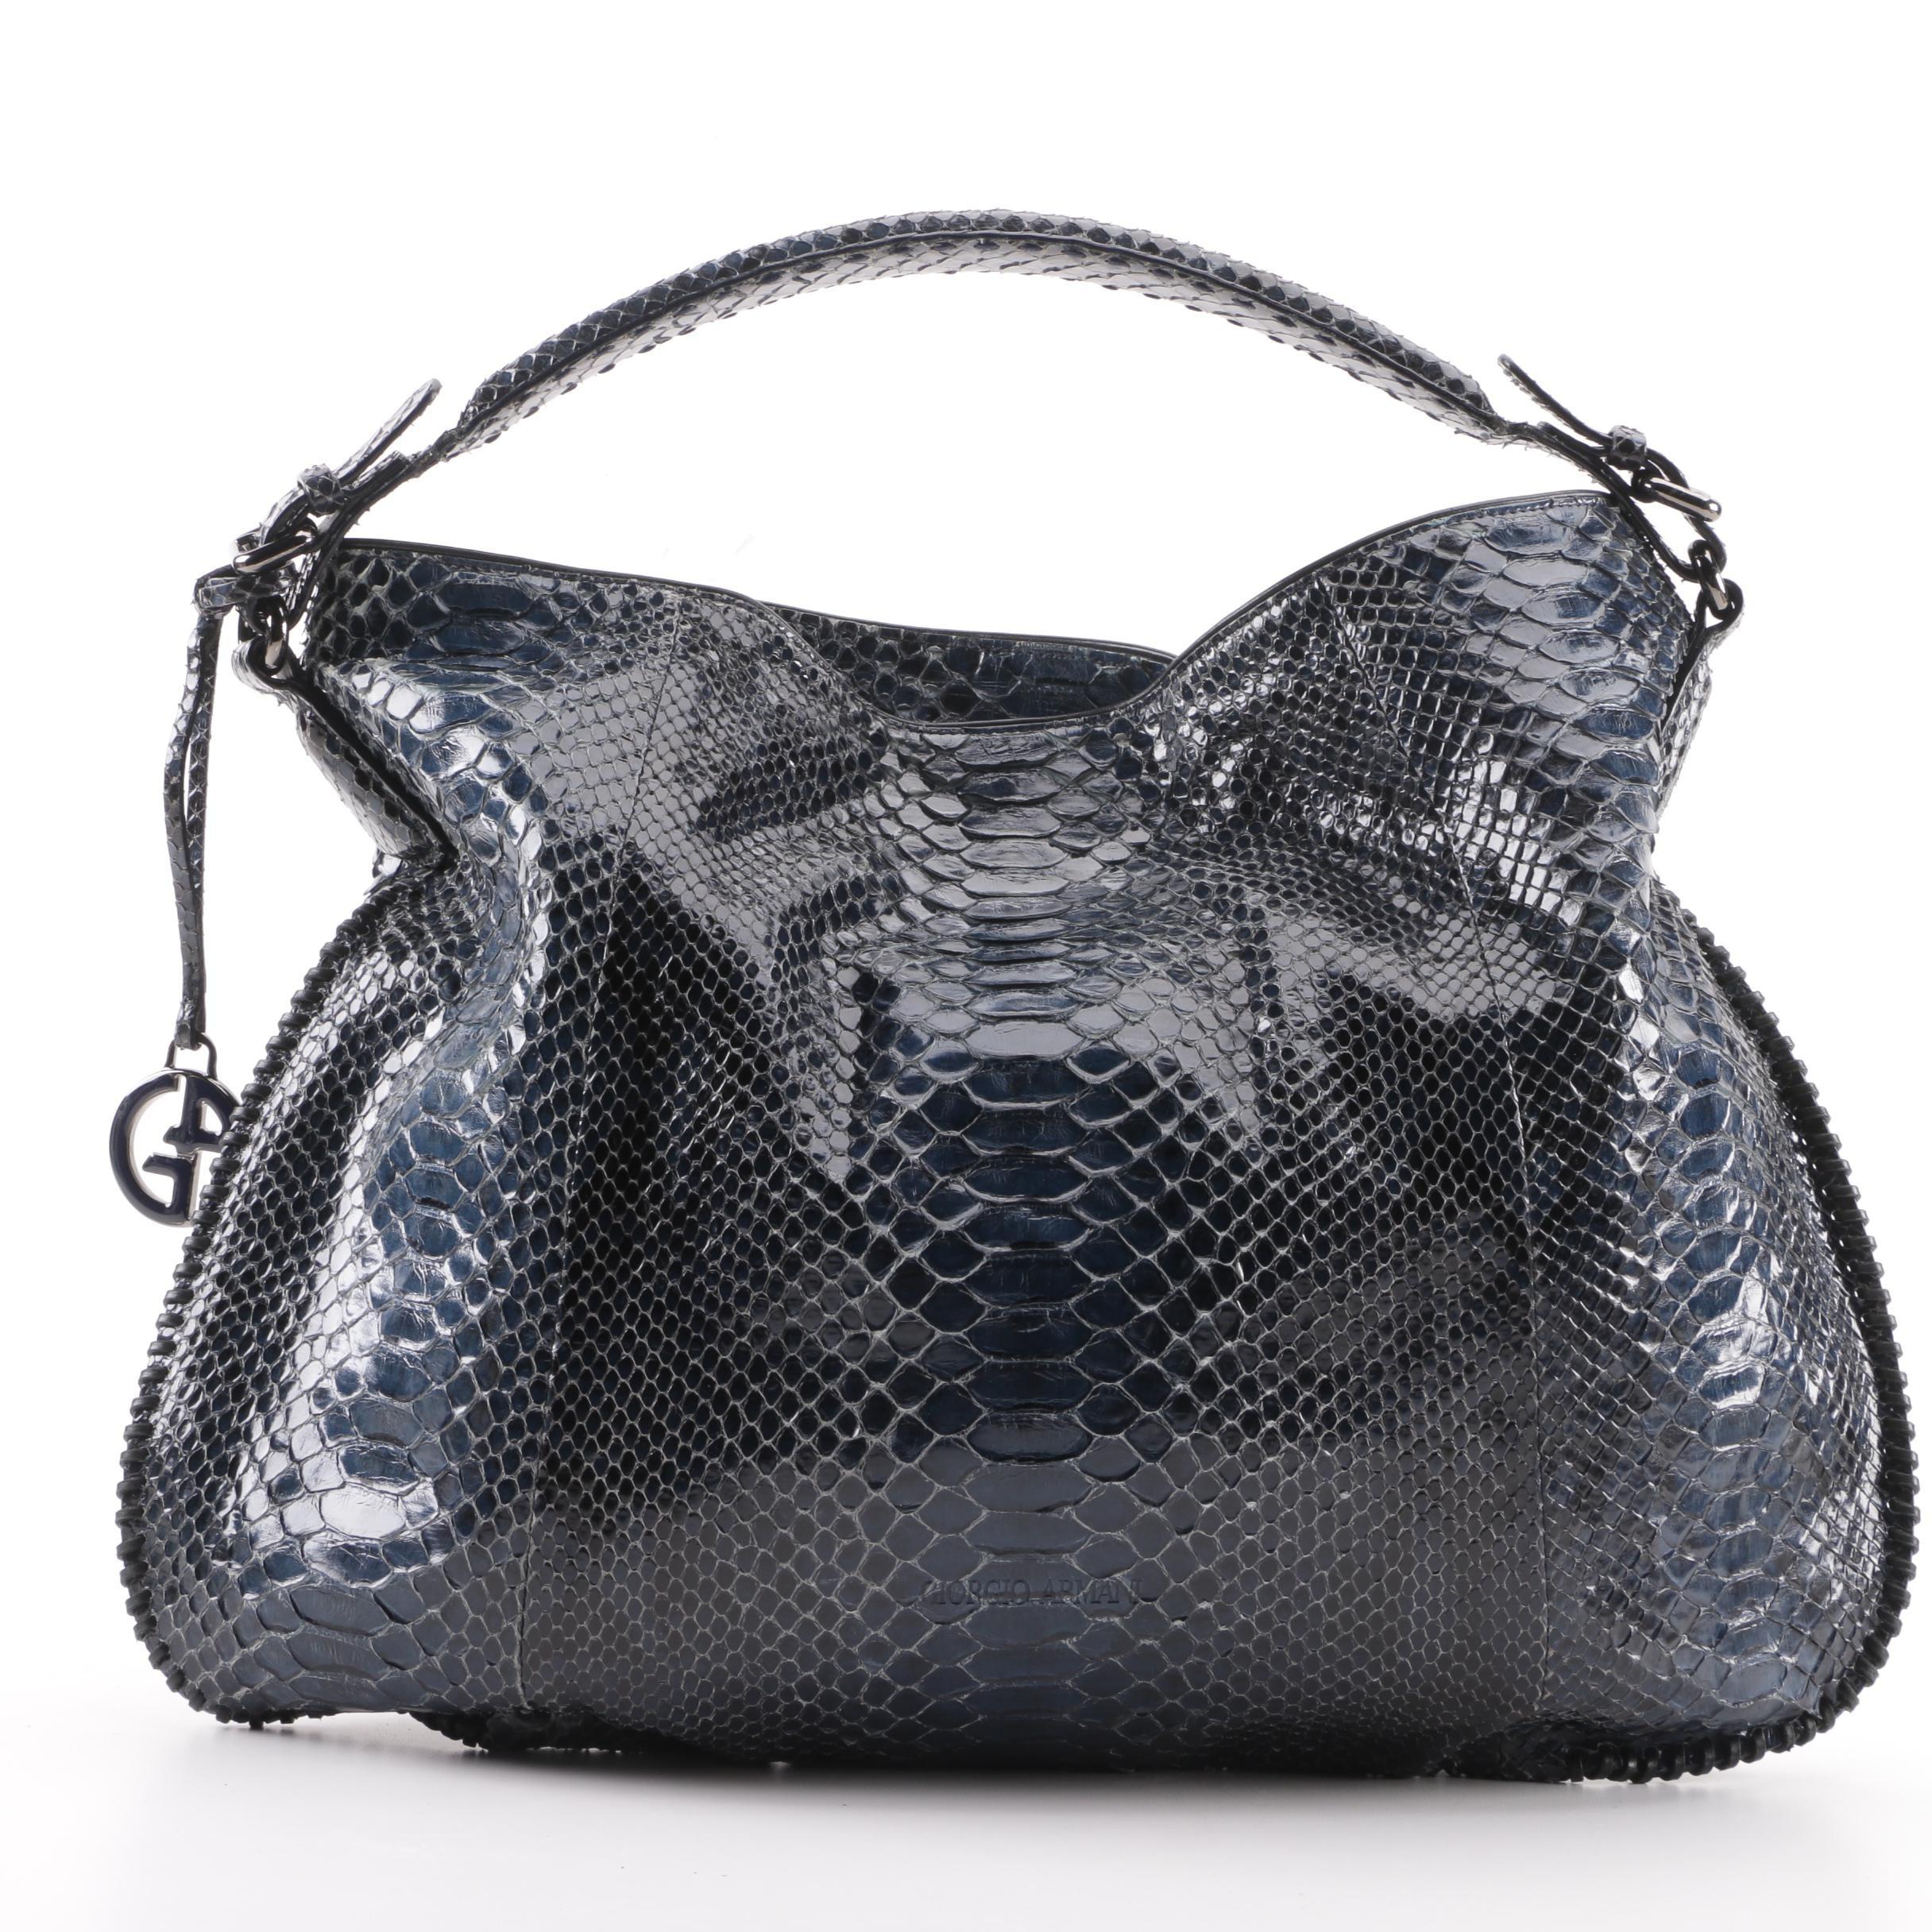 Giorgio Armani Blue Python Skin Hobo Bag